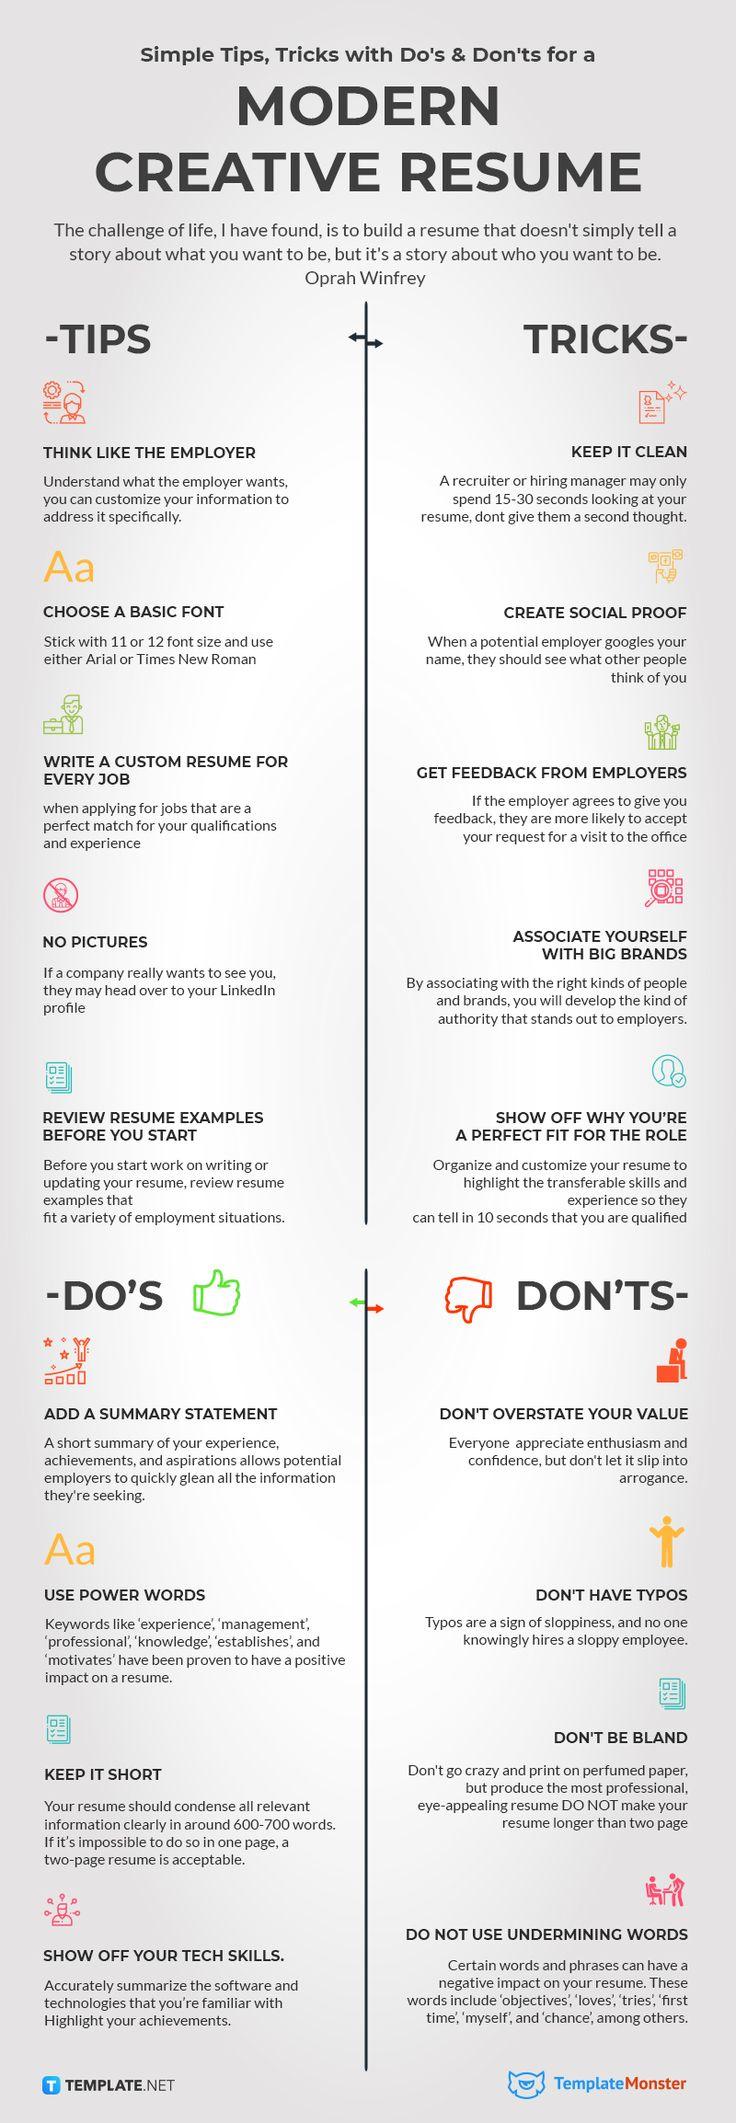 How To Create A Modern Creative Resume Infographics